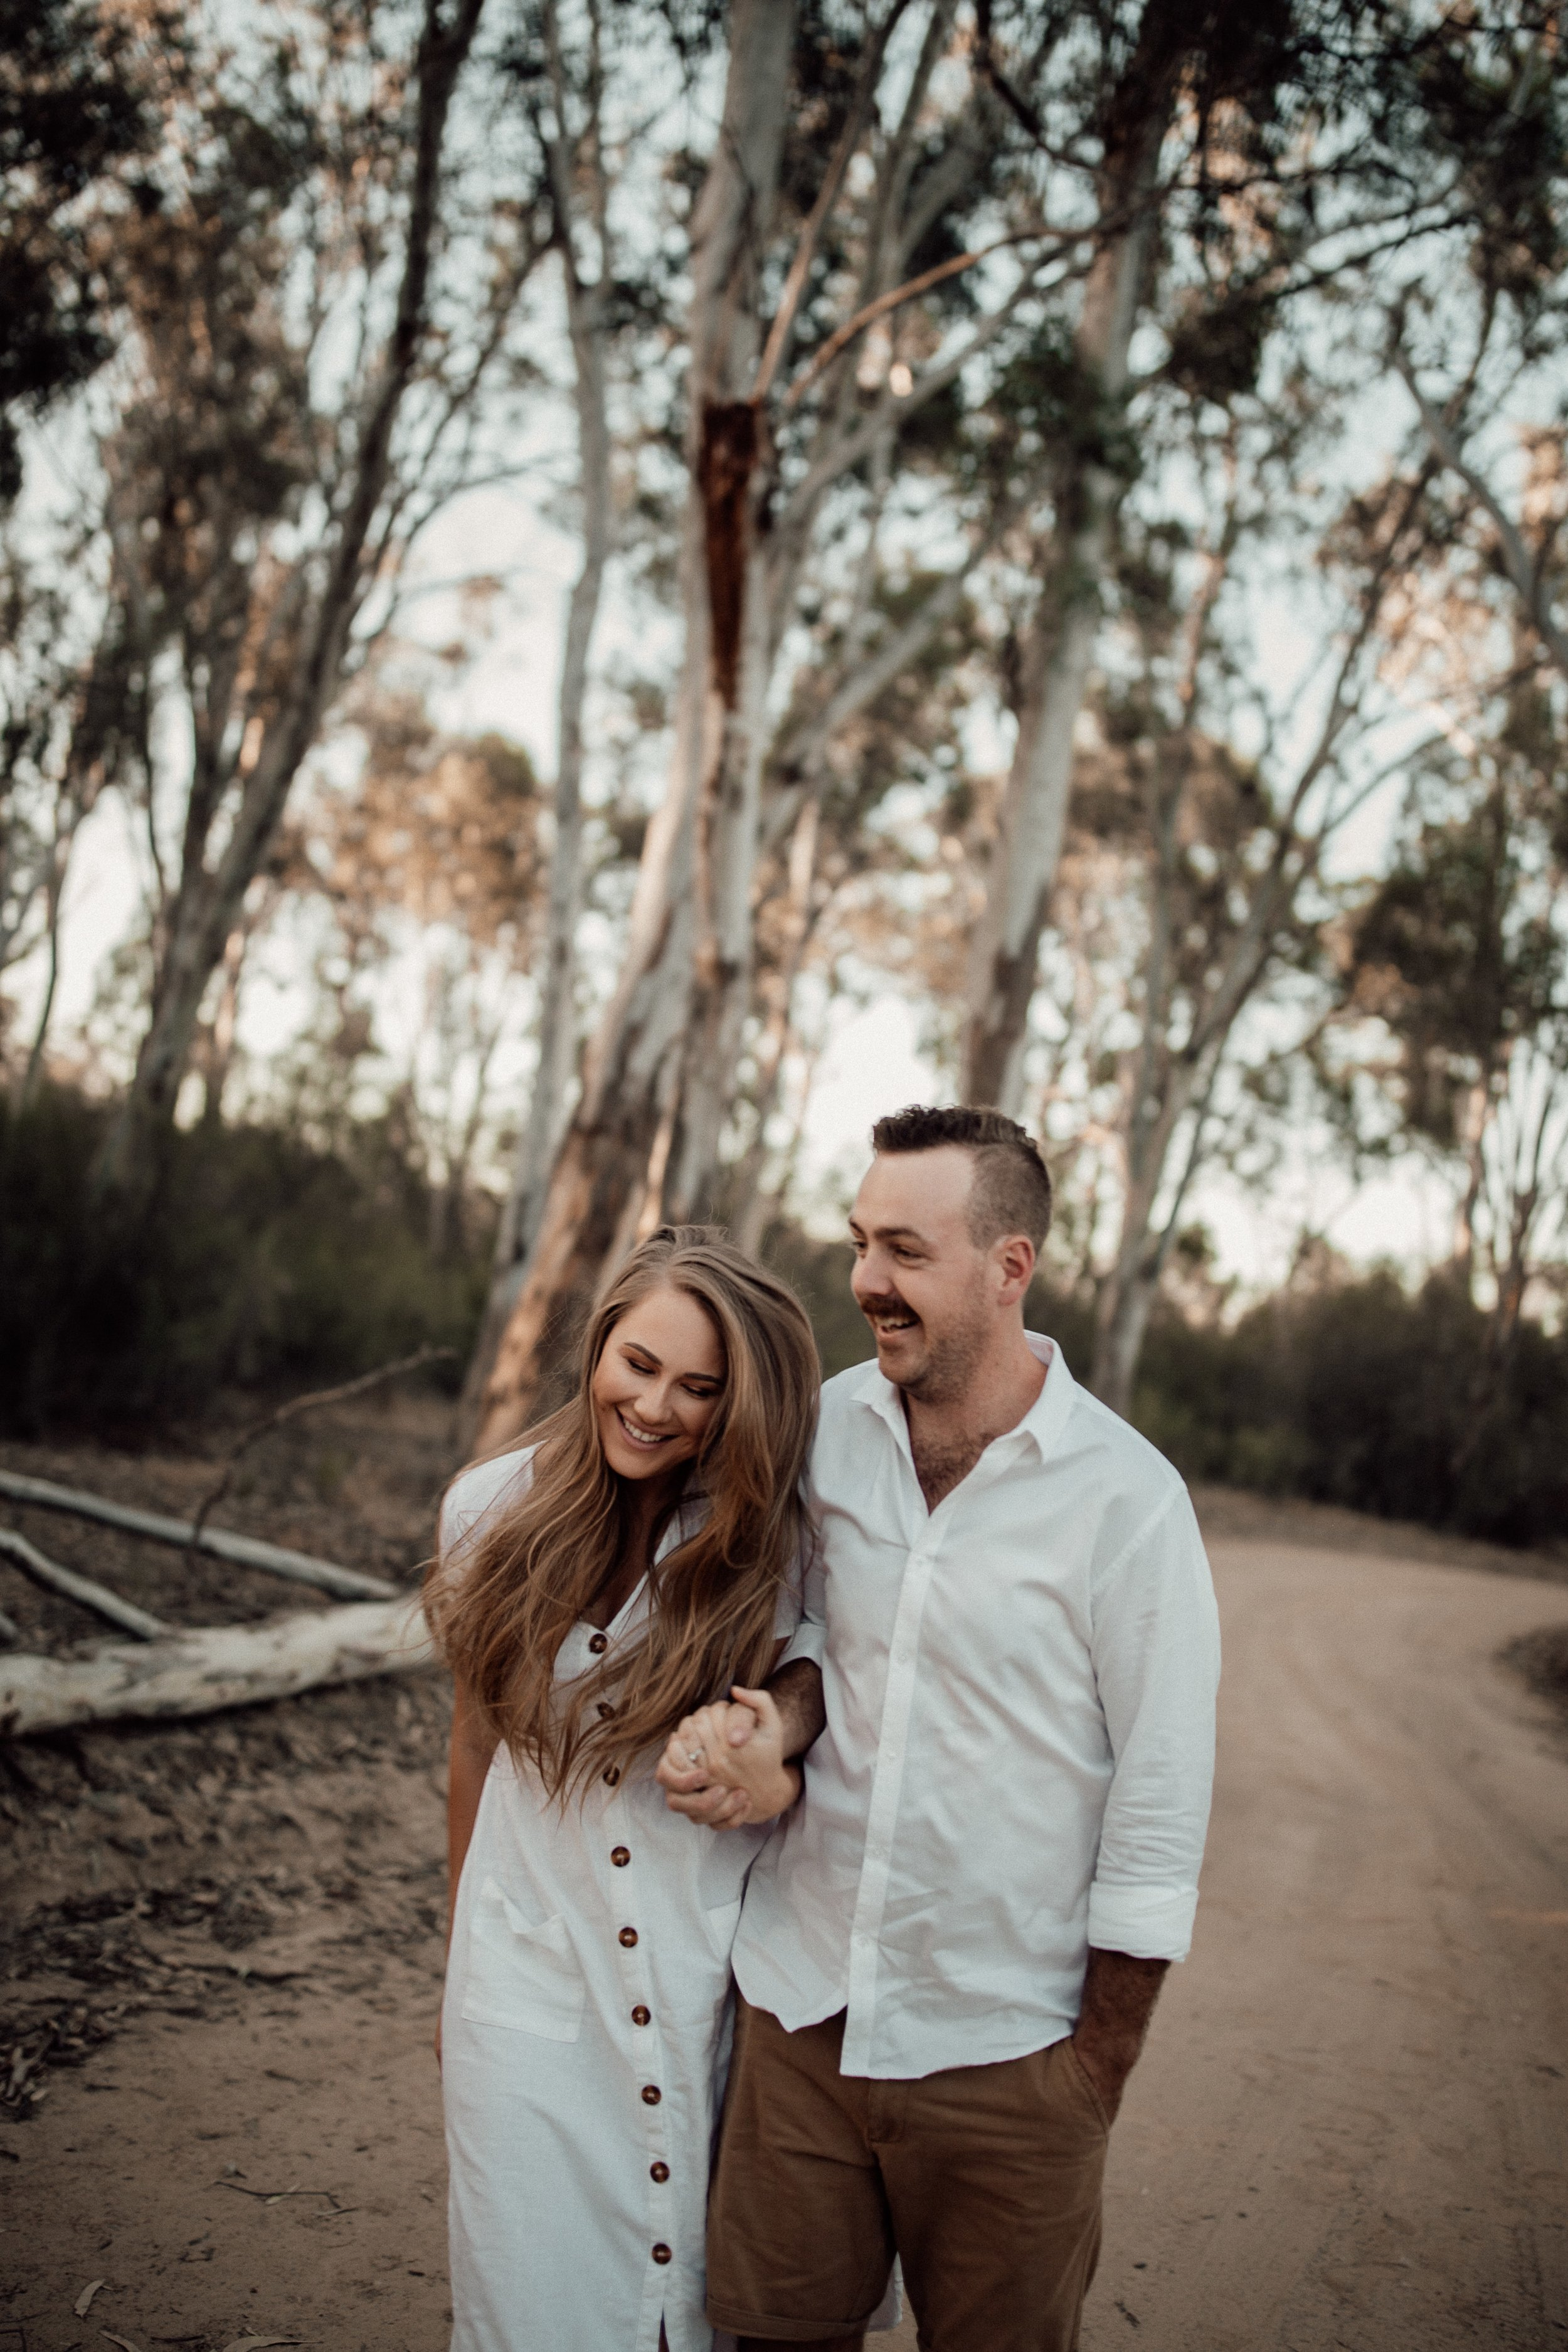 mickalathomas_puremacphotography_weddingphotographer_couplephotographer_Sheppartonphotographer_1490.jpg